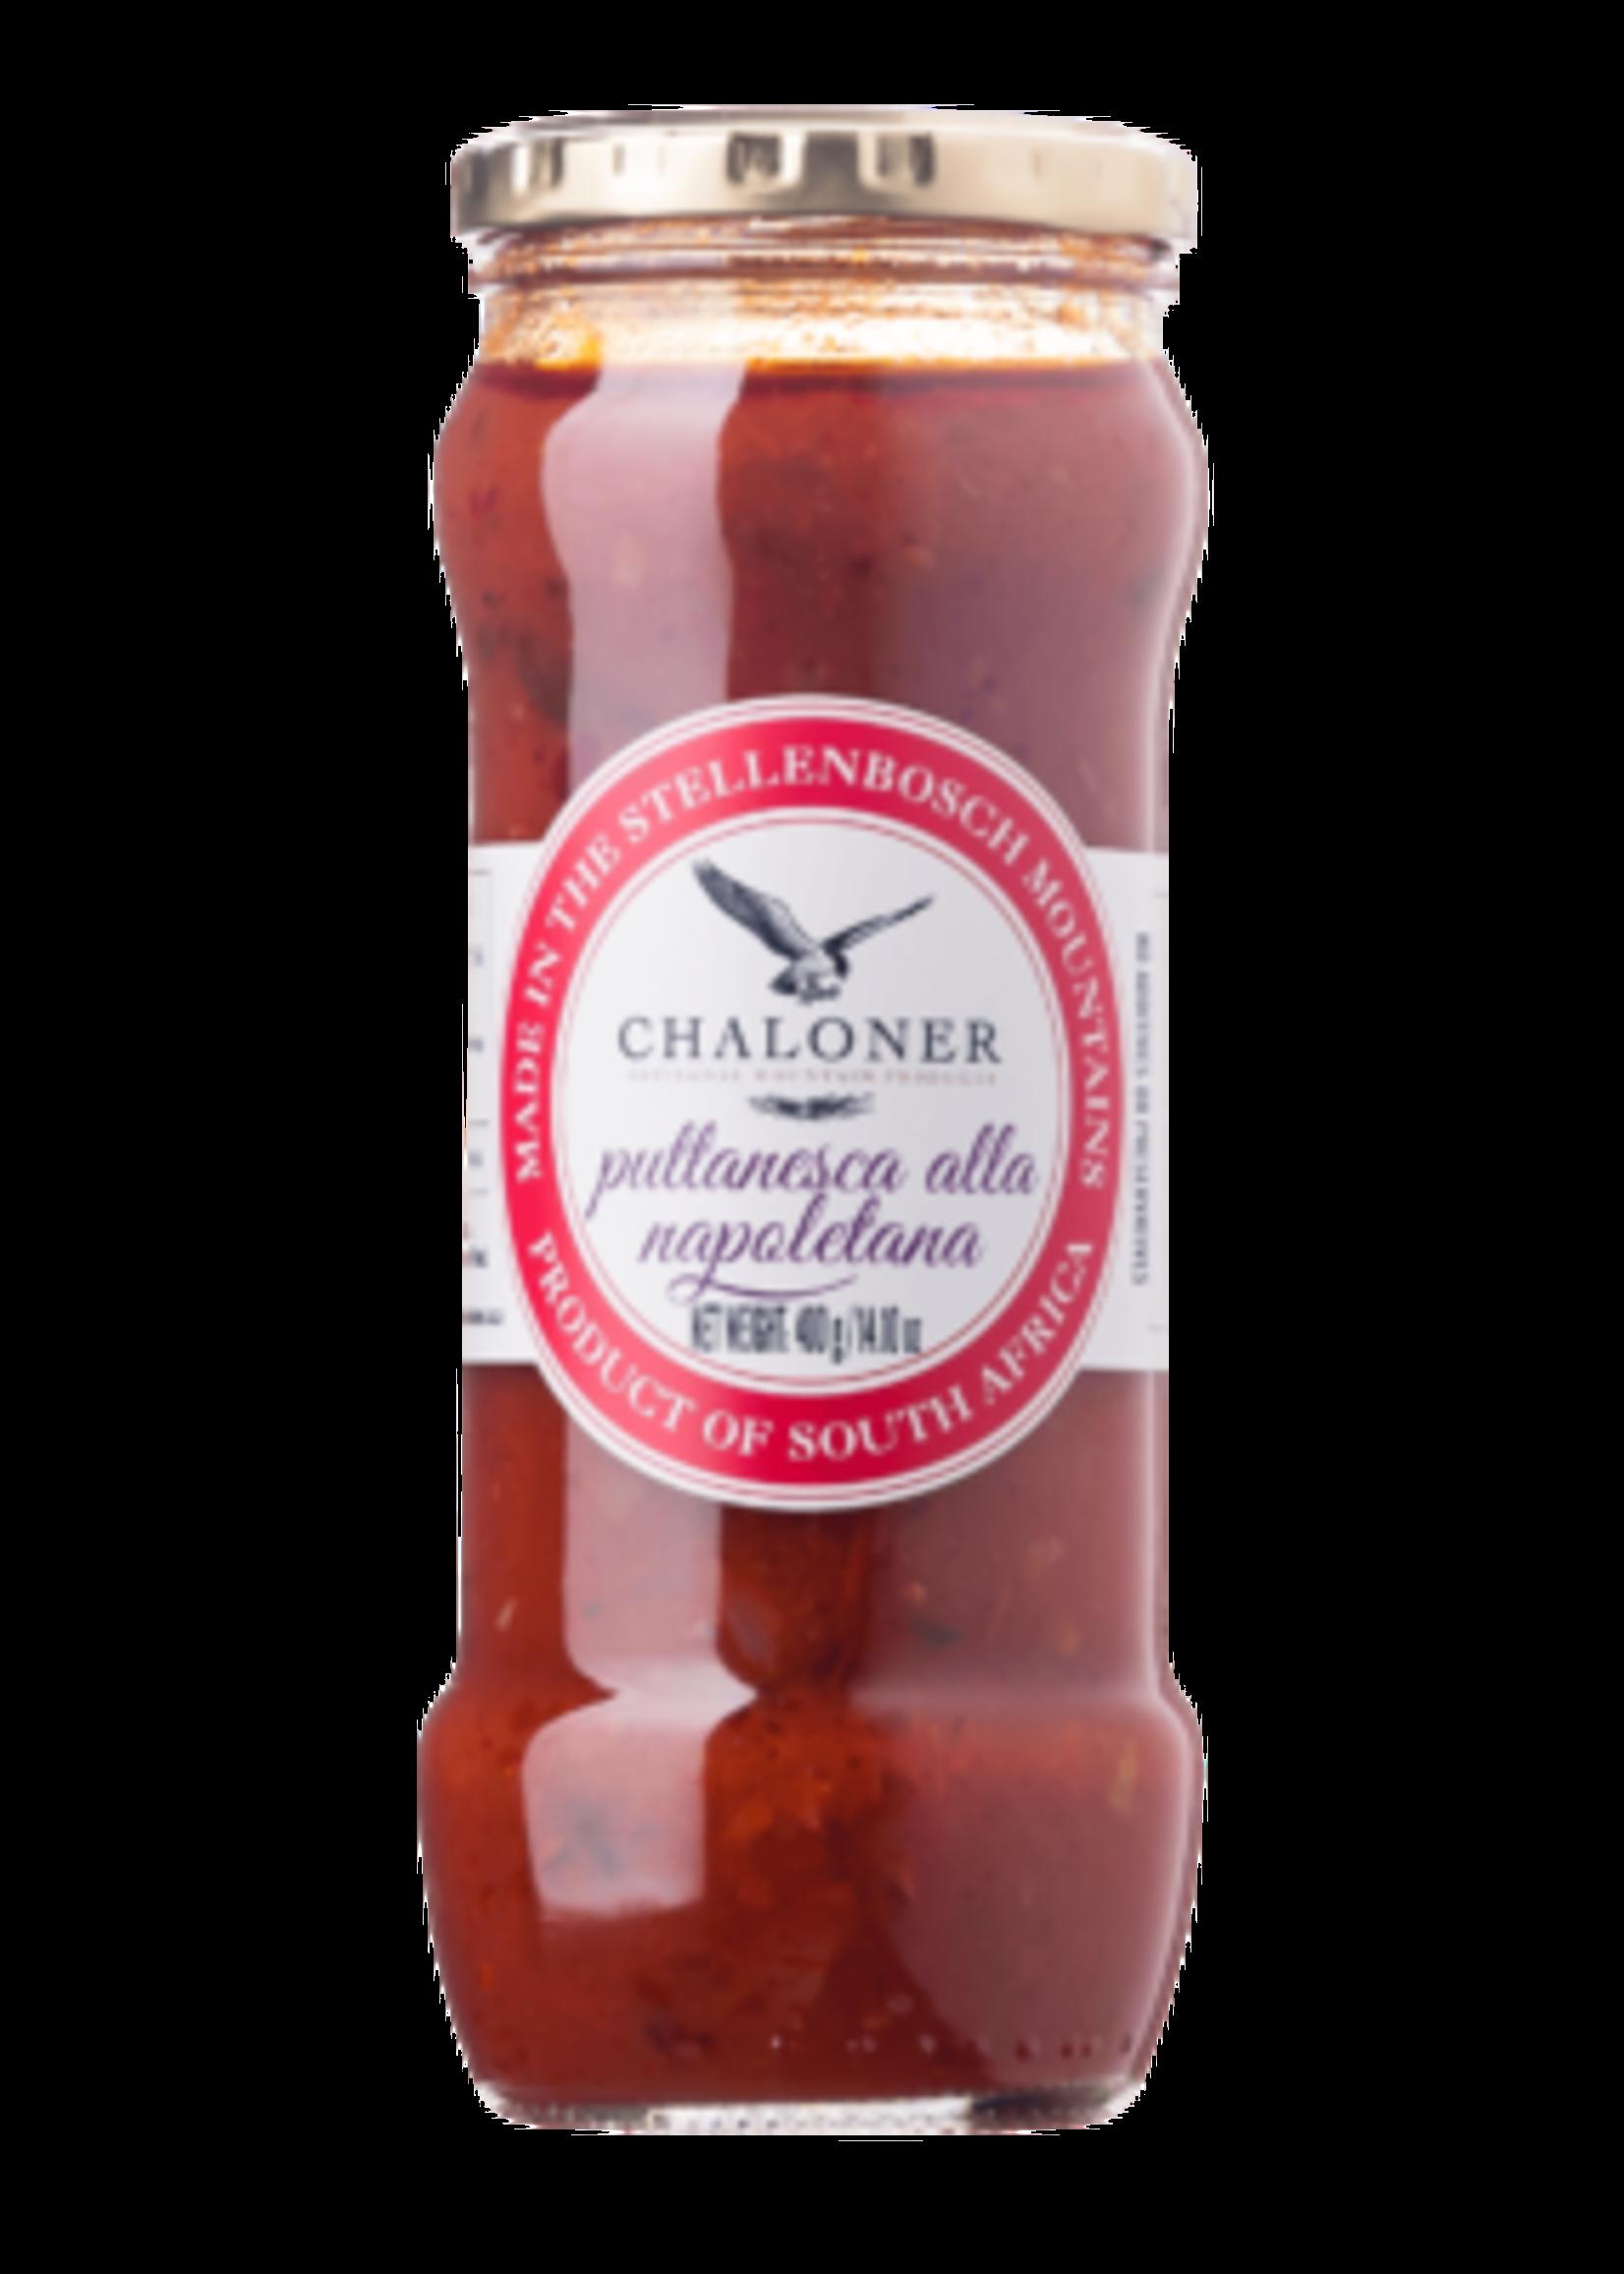 Chaloner Chaloner - Puttanesca pasta sauce